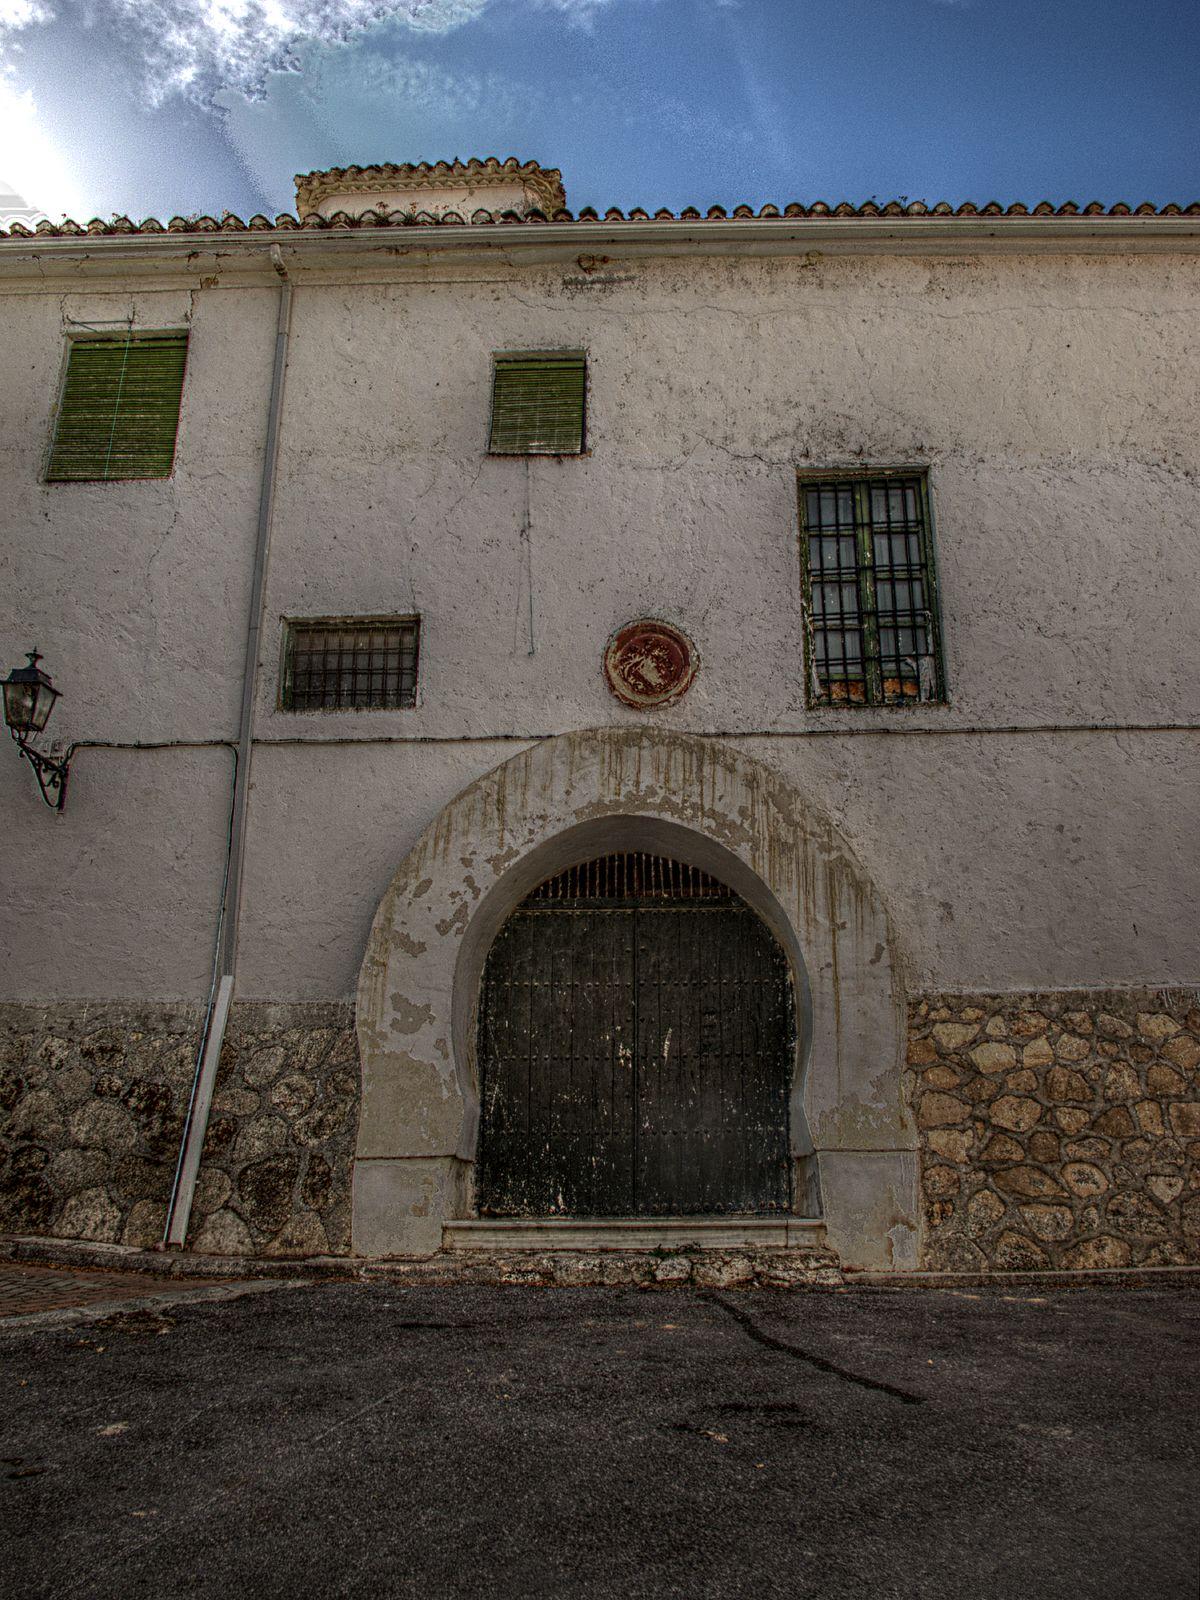 Castillo de tajarja monumento wikipedia la enciclopedia libre - Castillo de azay le rideau ...